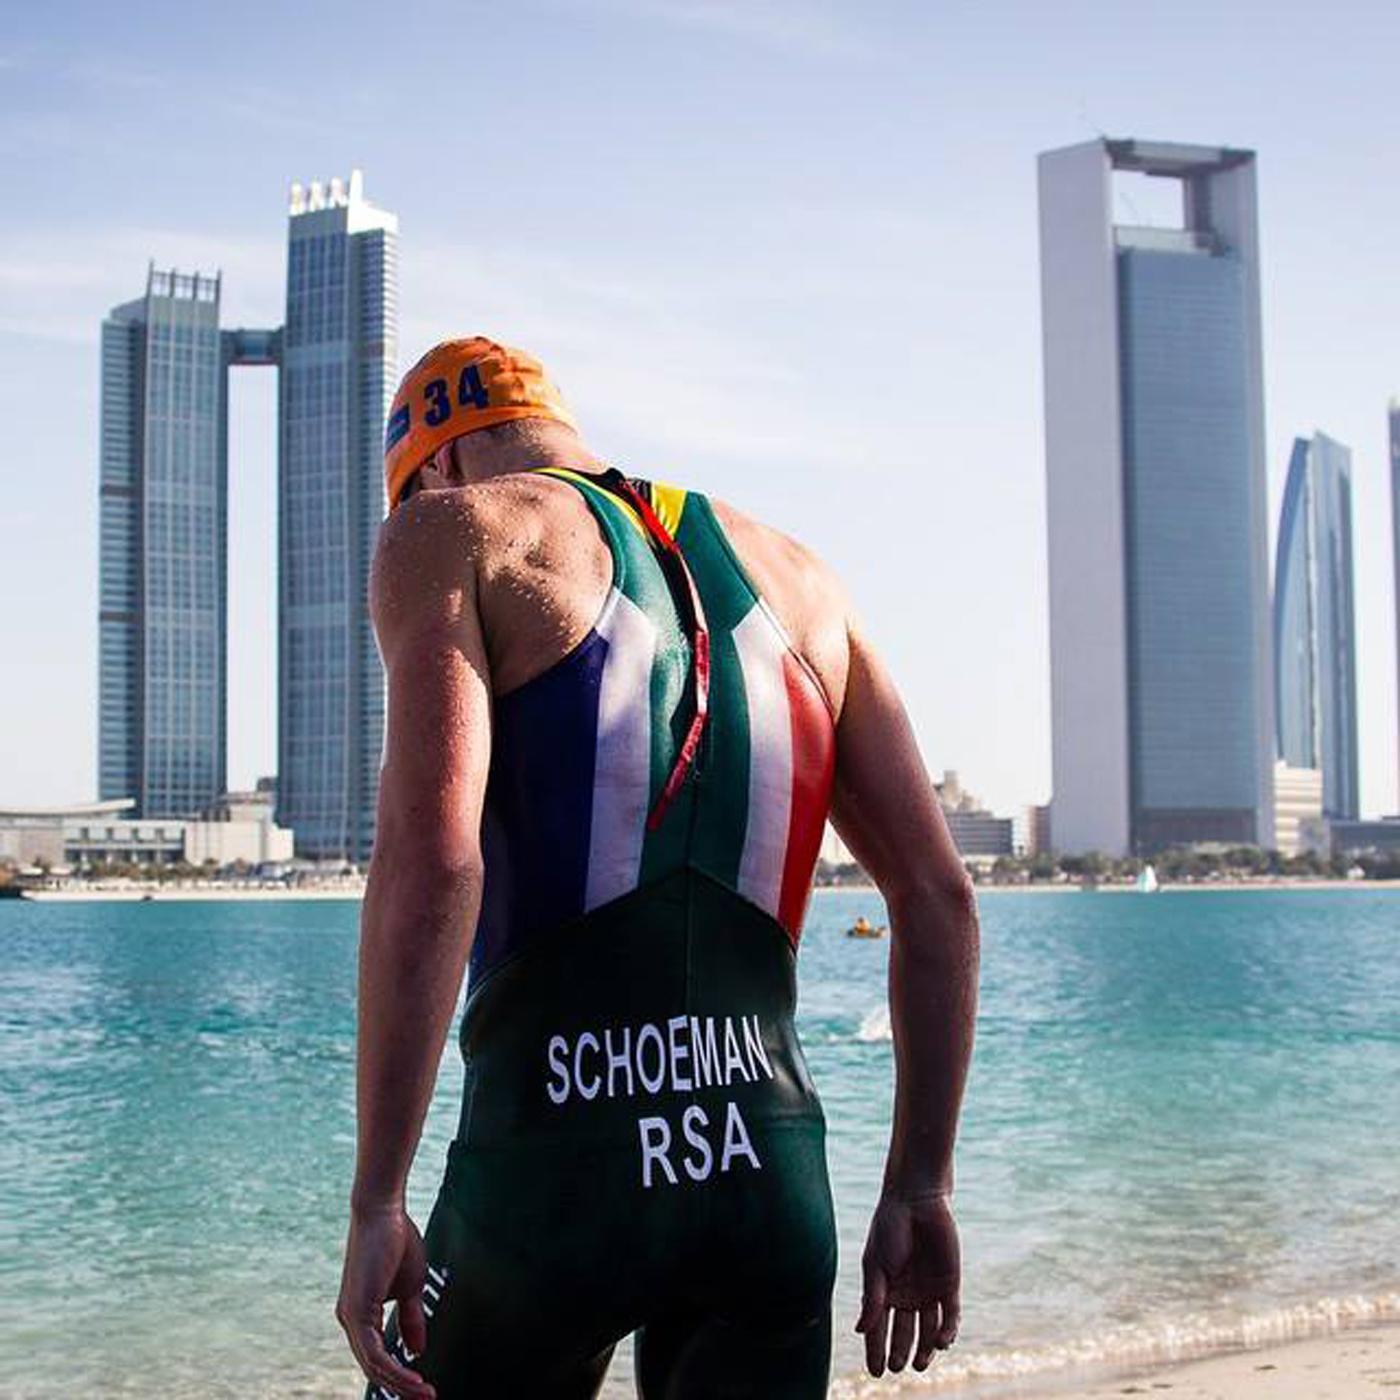 South African triathlete Henri Schoeman at swim start in Abu Dhabi.